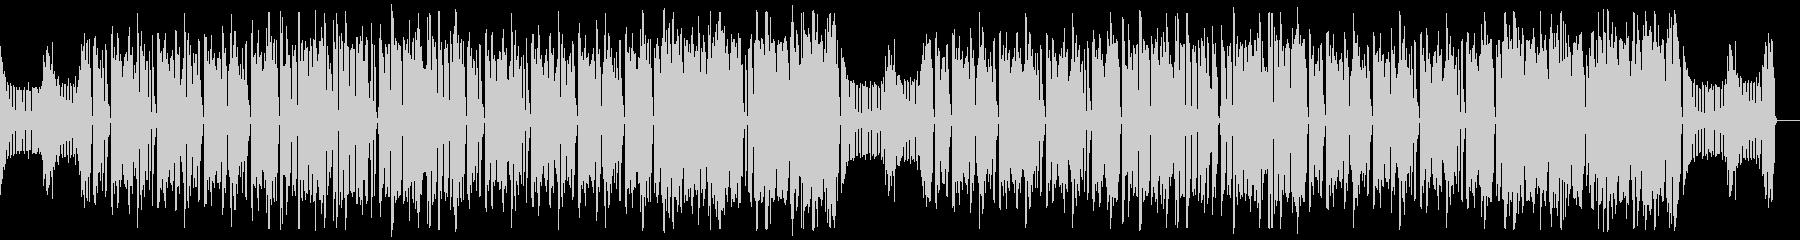 【EDM,ダブステップ】映像、CM制作向の未再生の波形